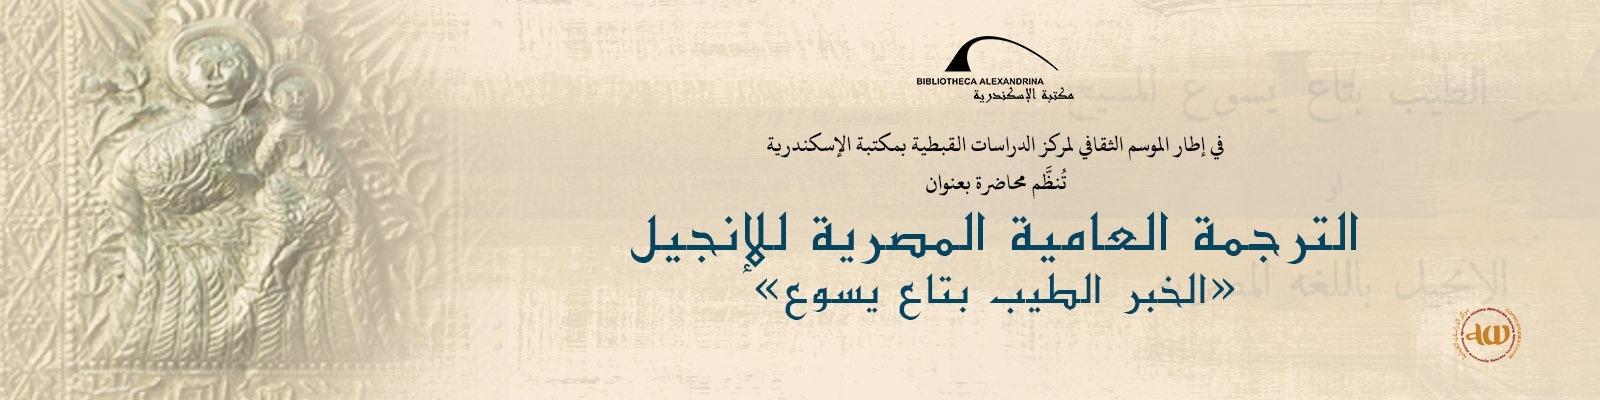 La bible en arabe dialectal égyptien